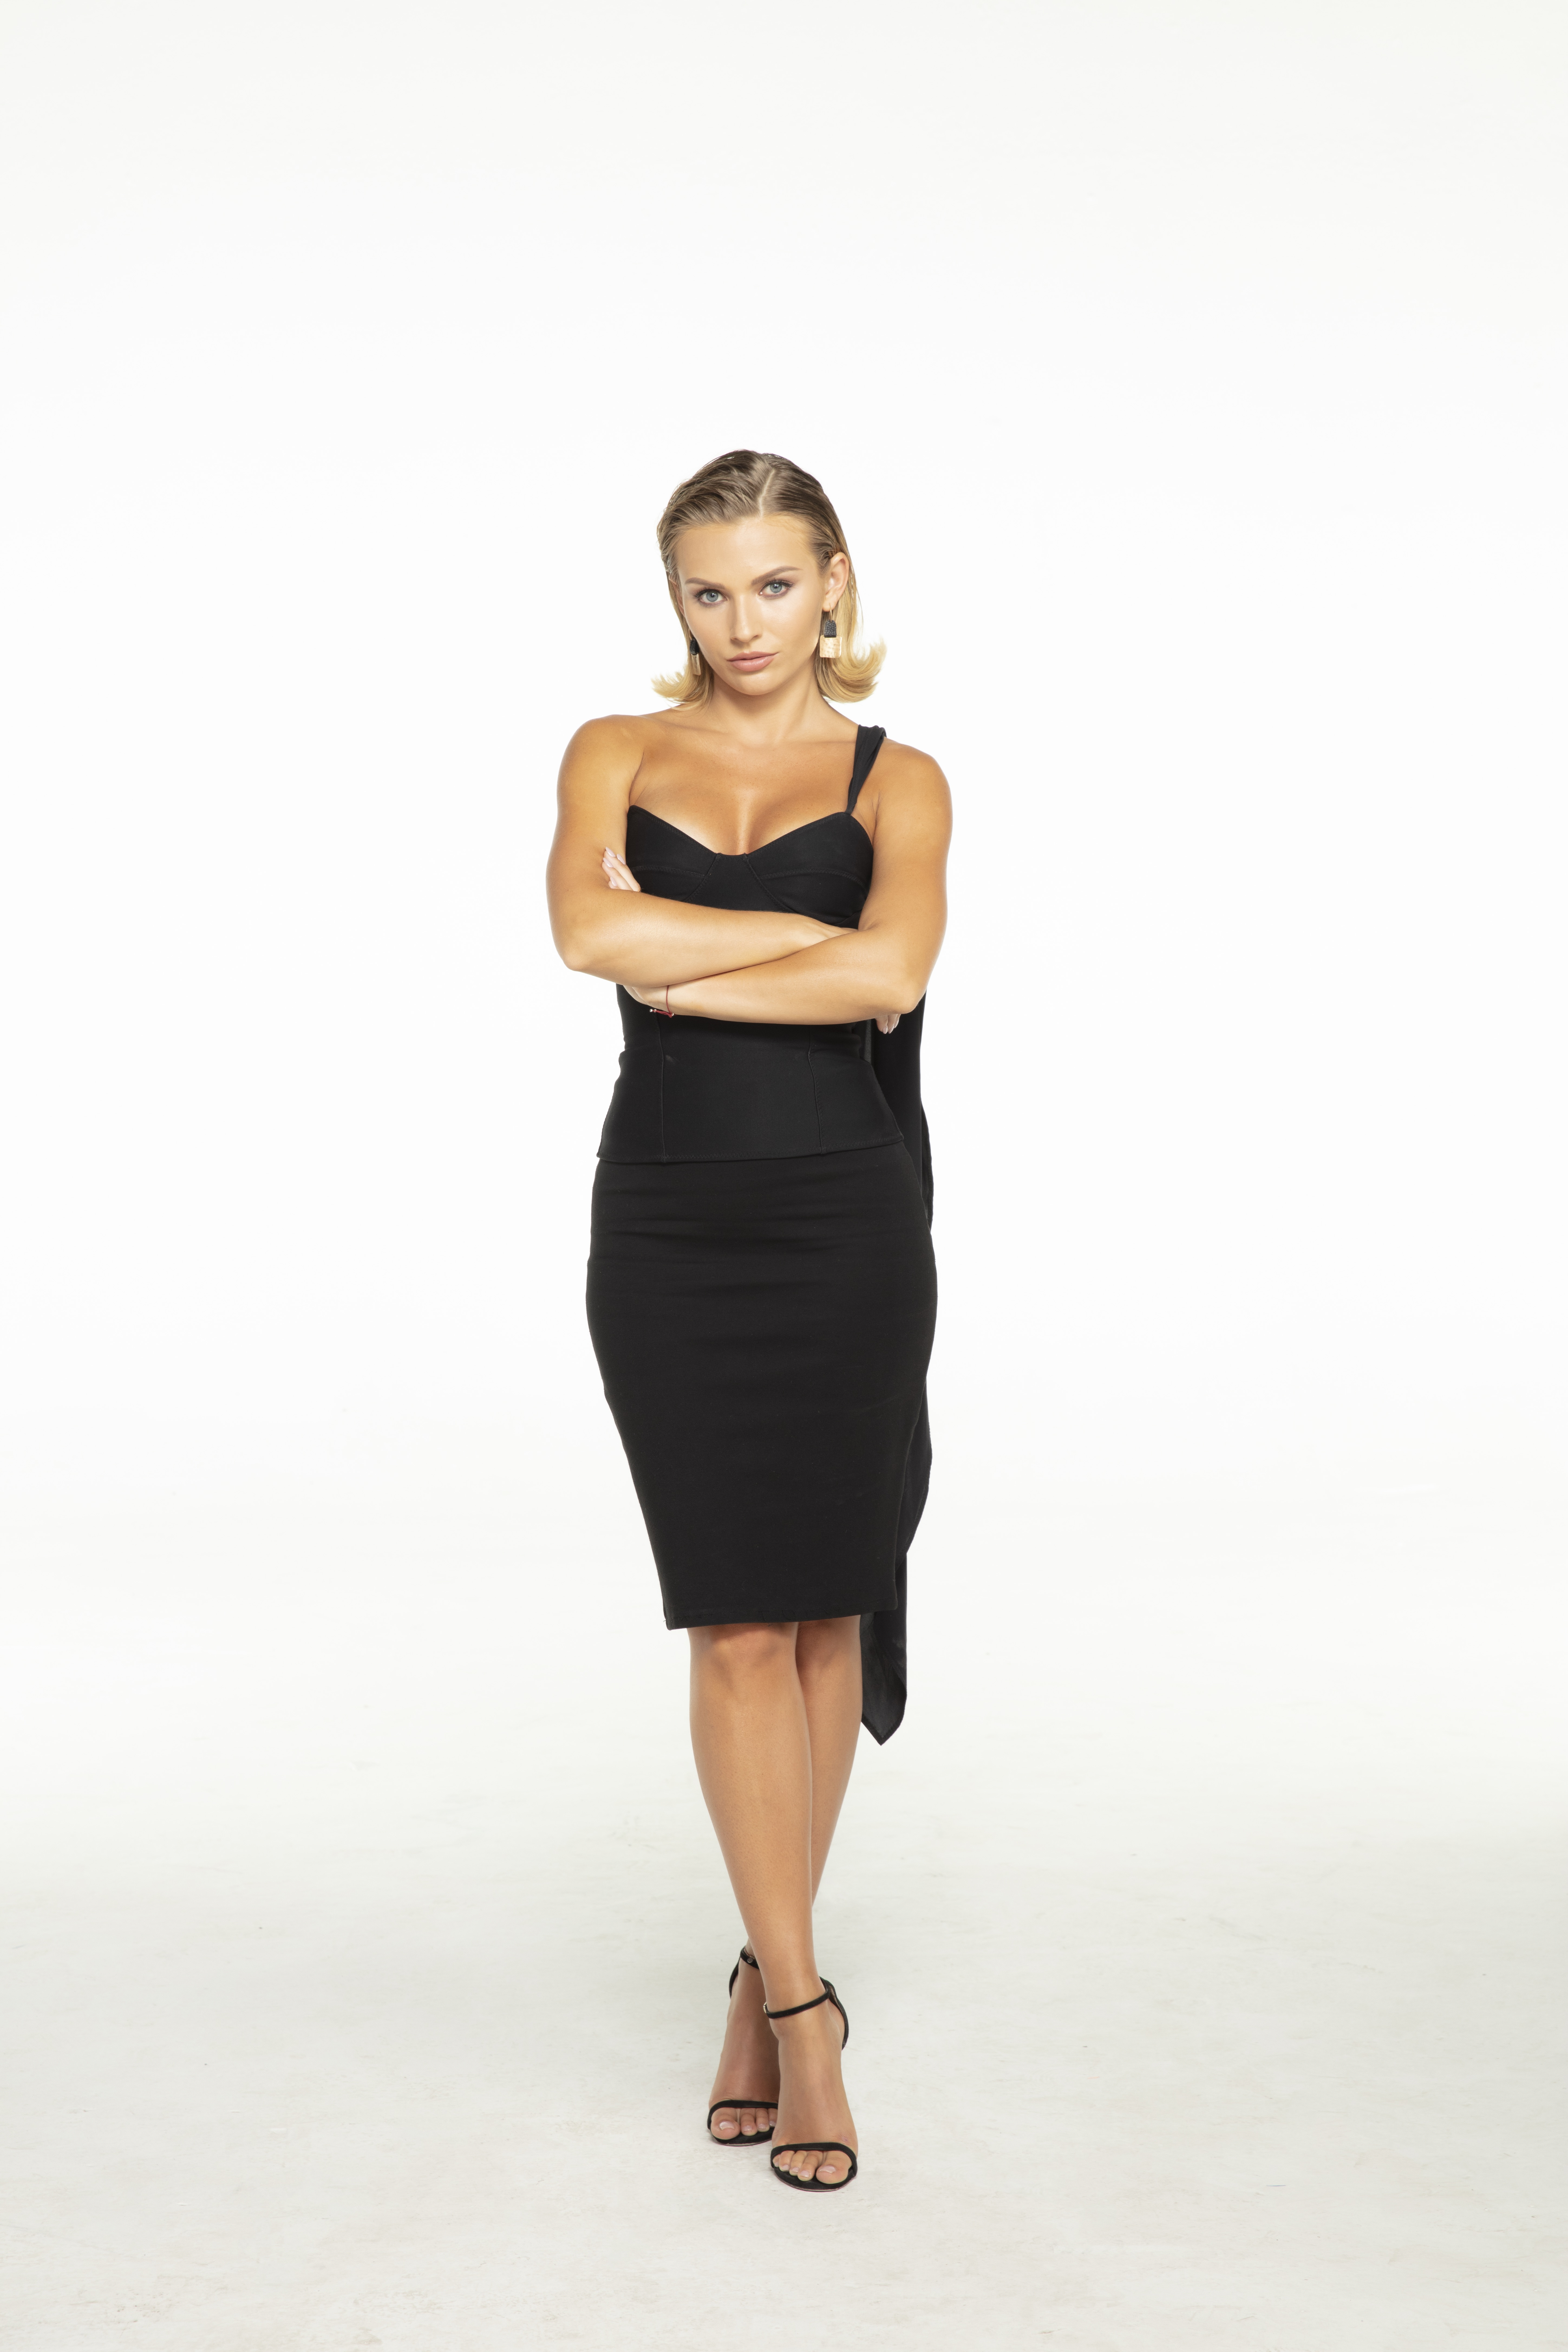 Irina Baeva 2